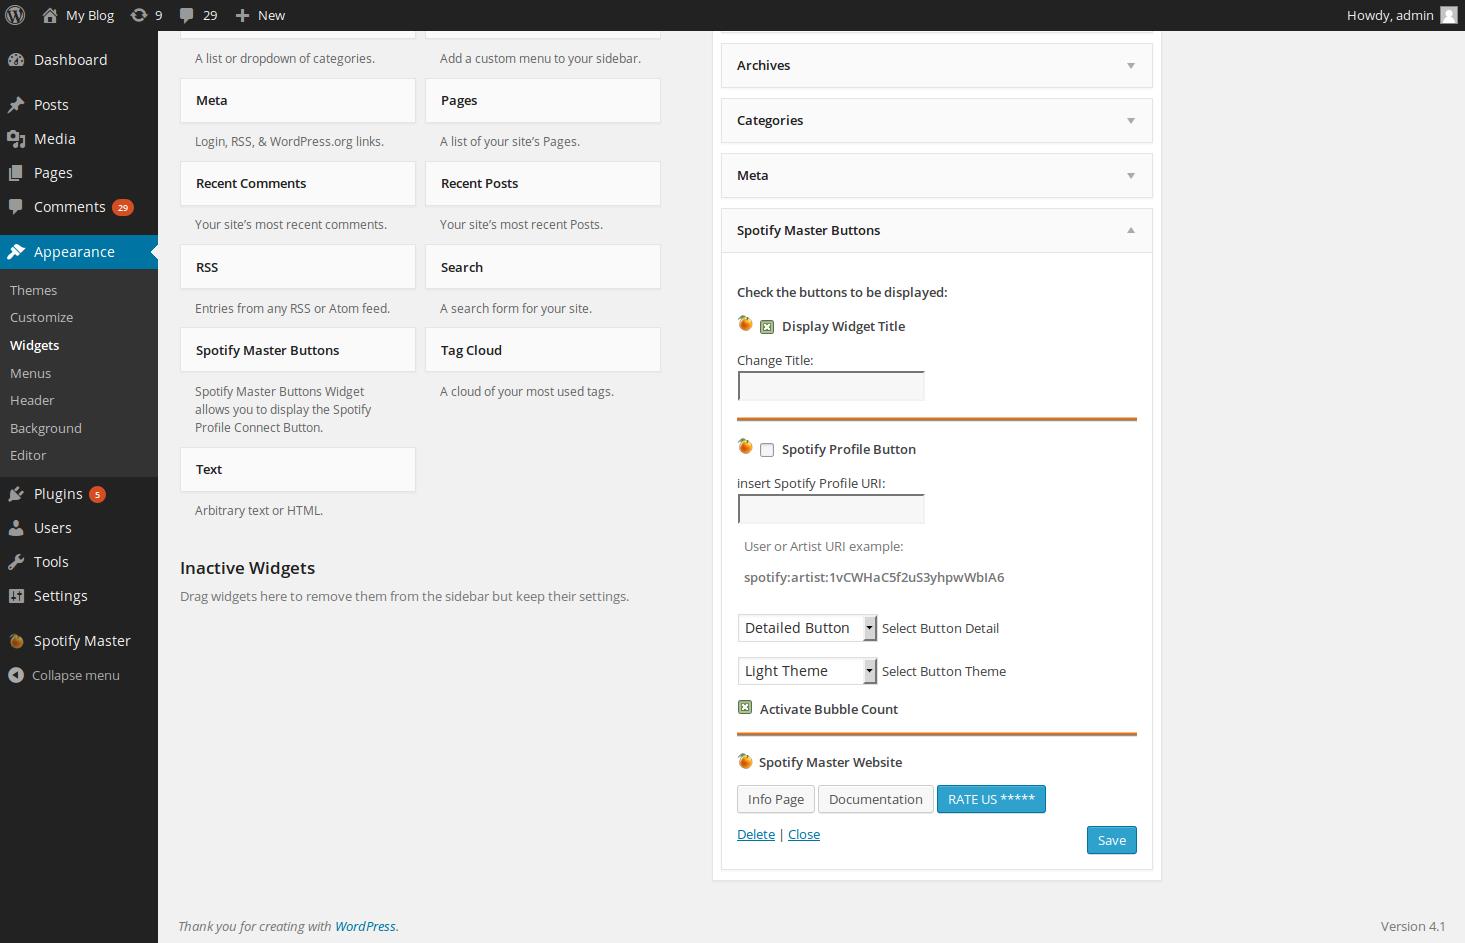 Adding a Spotify widget to WordPress with the Spotify Master